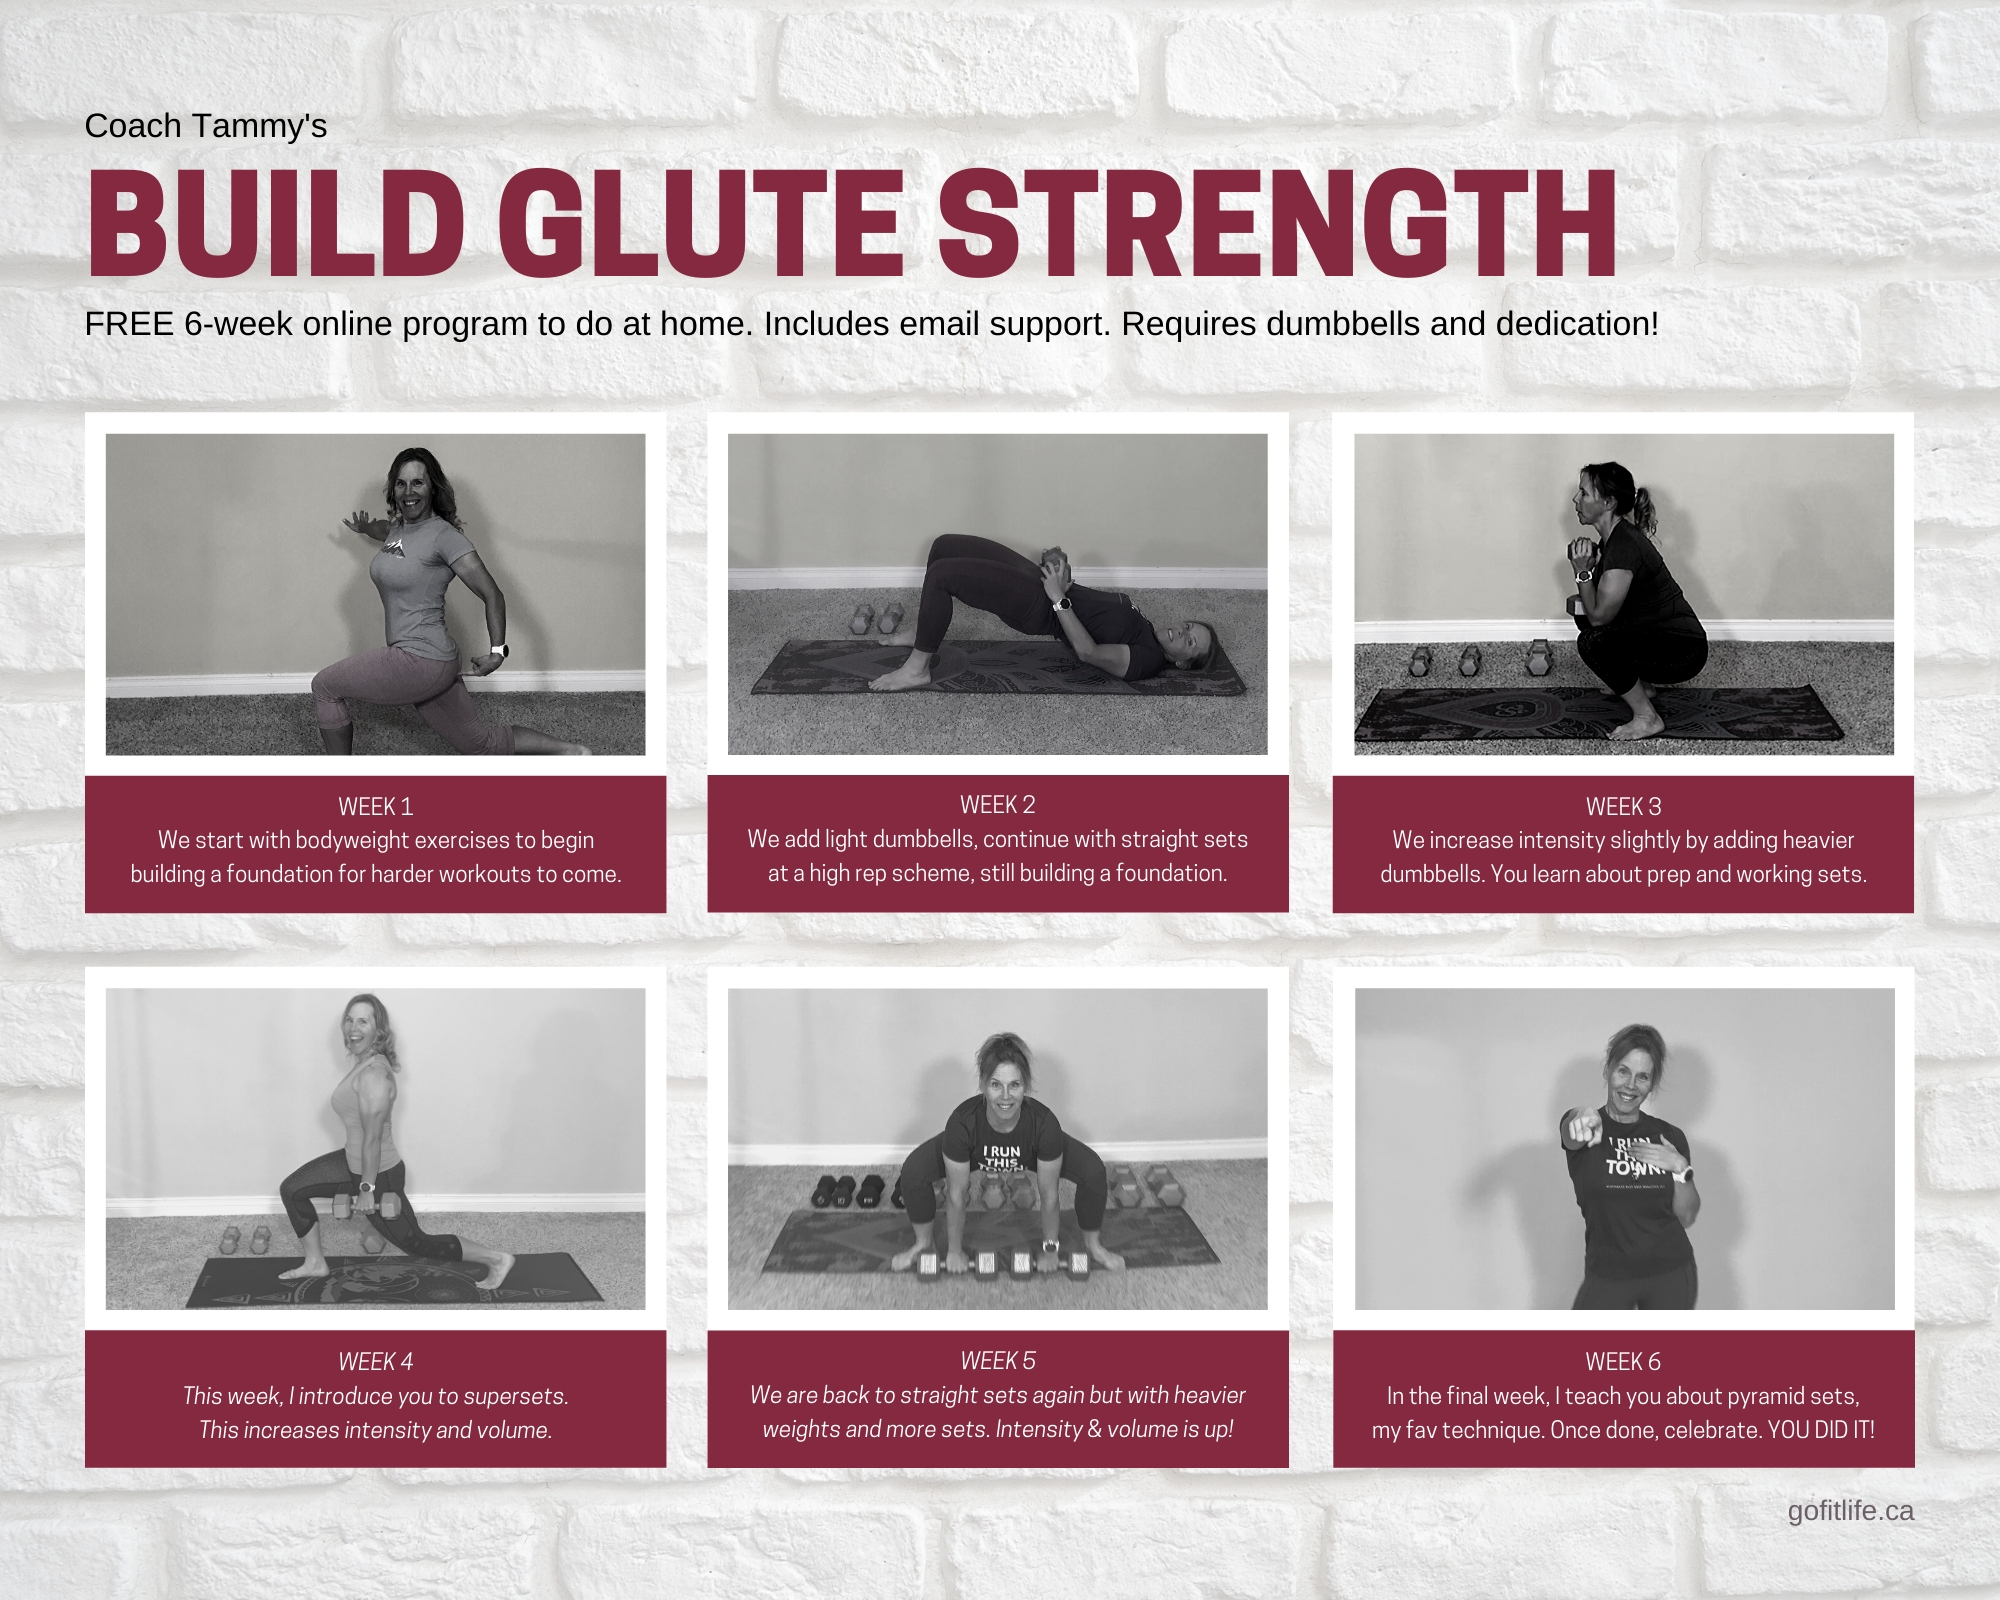 Build Glute Strength 6-Week Online Program